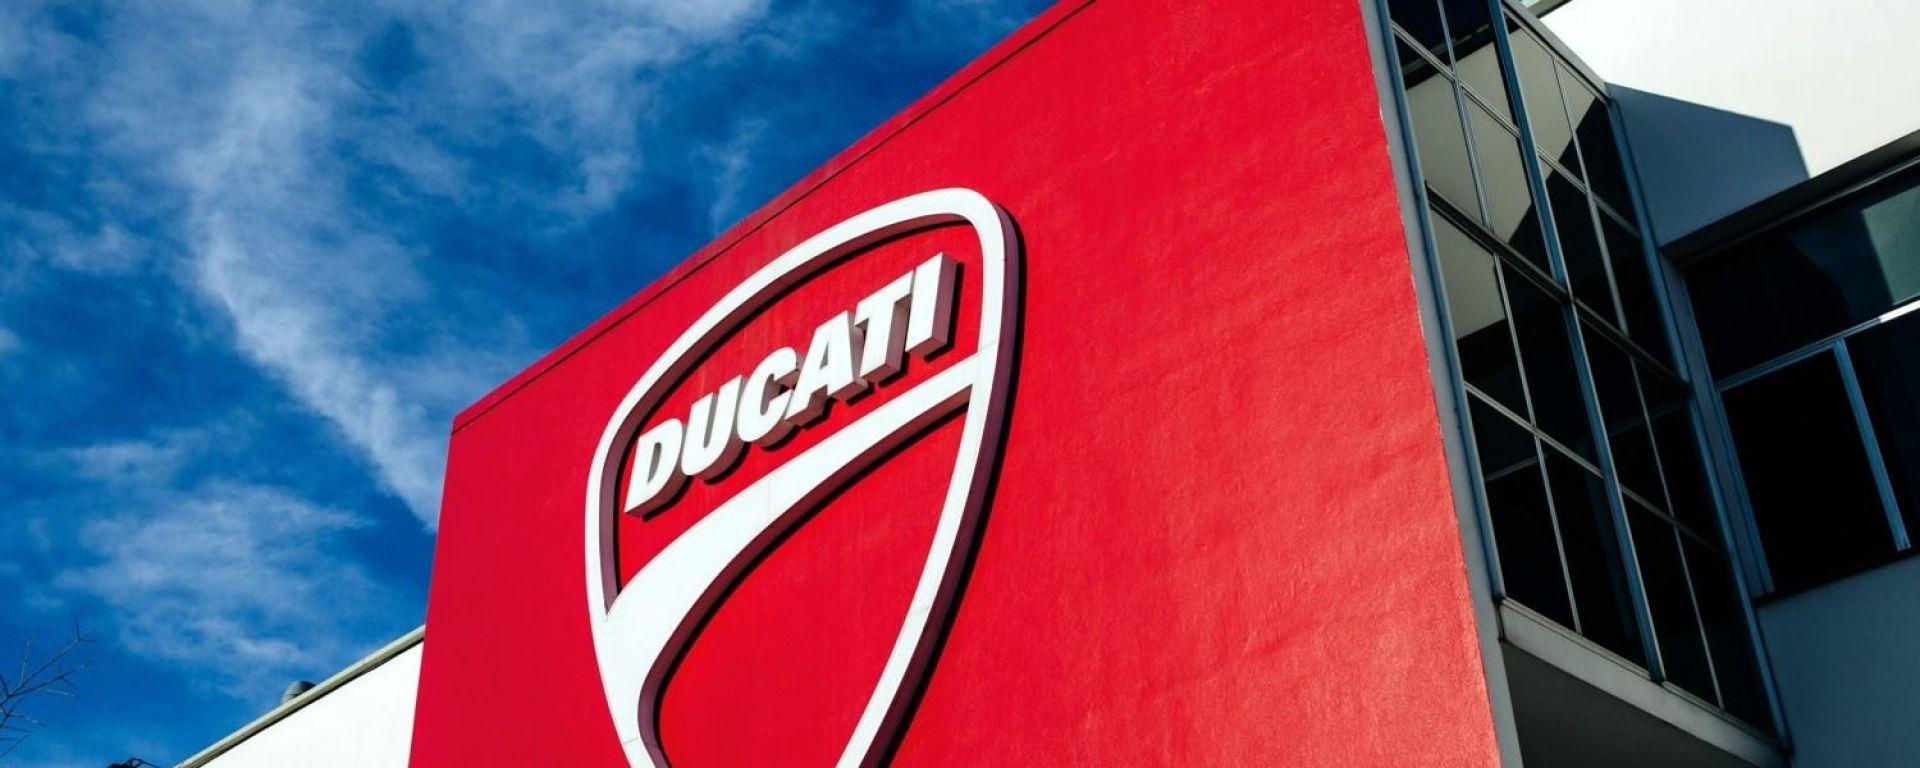 Ducati: voci di vendita da parte di Volkswagen?